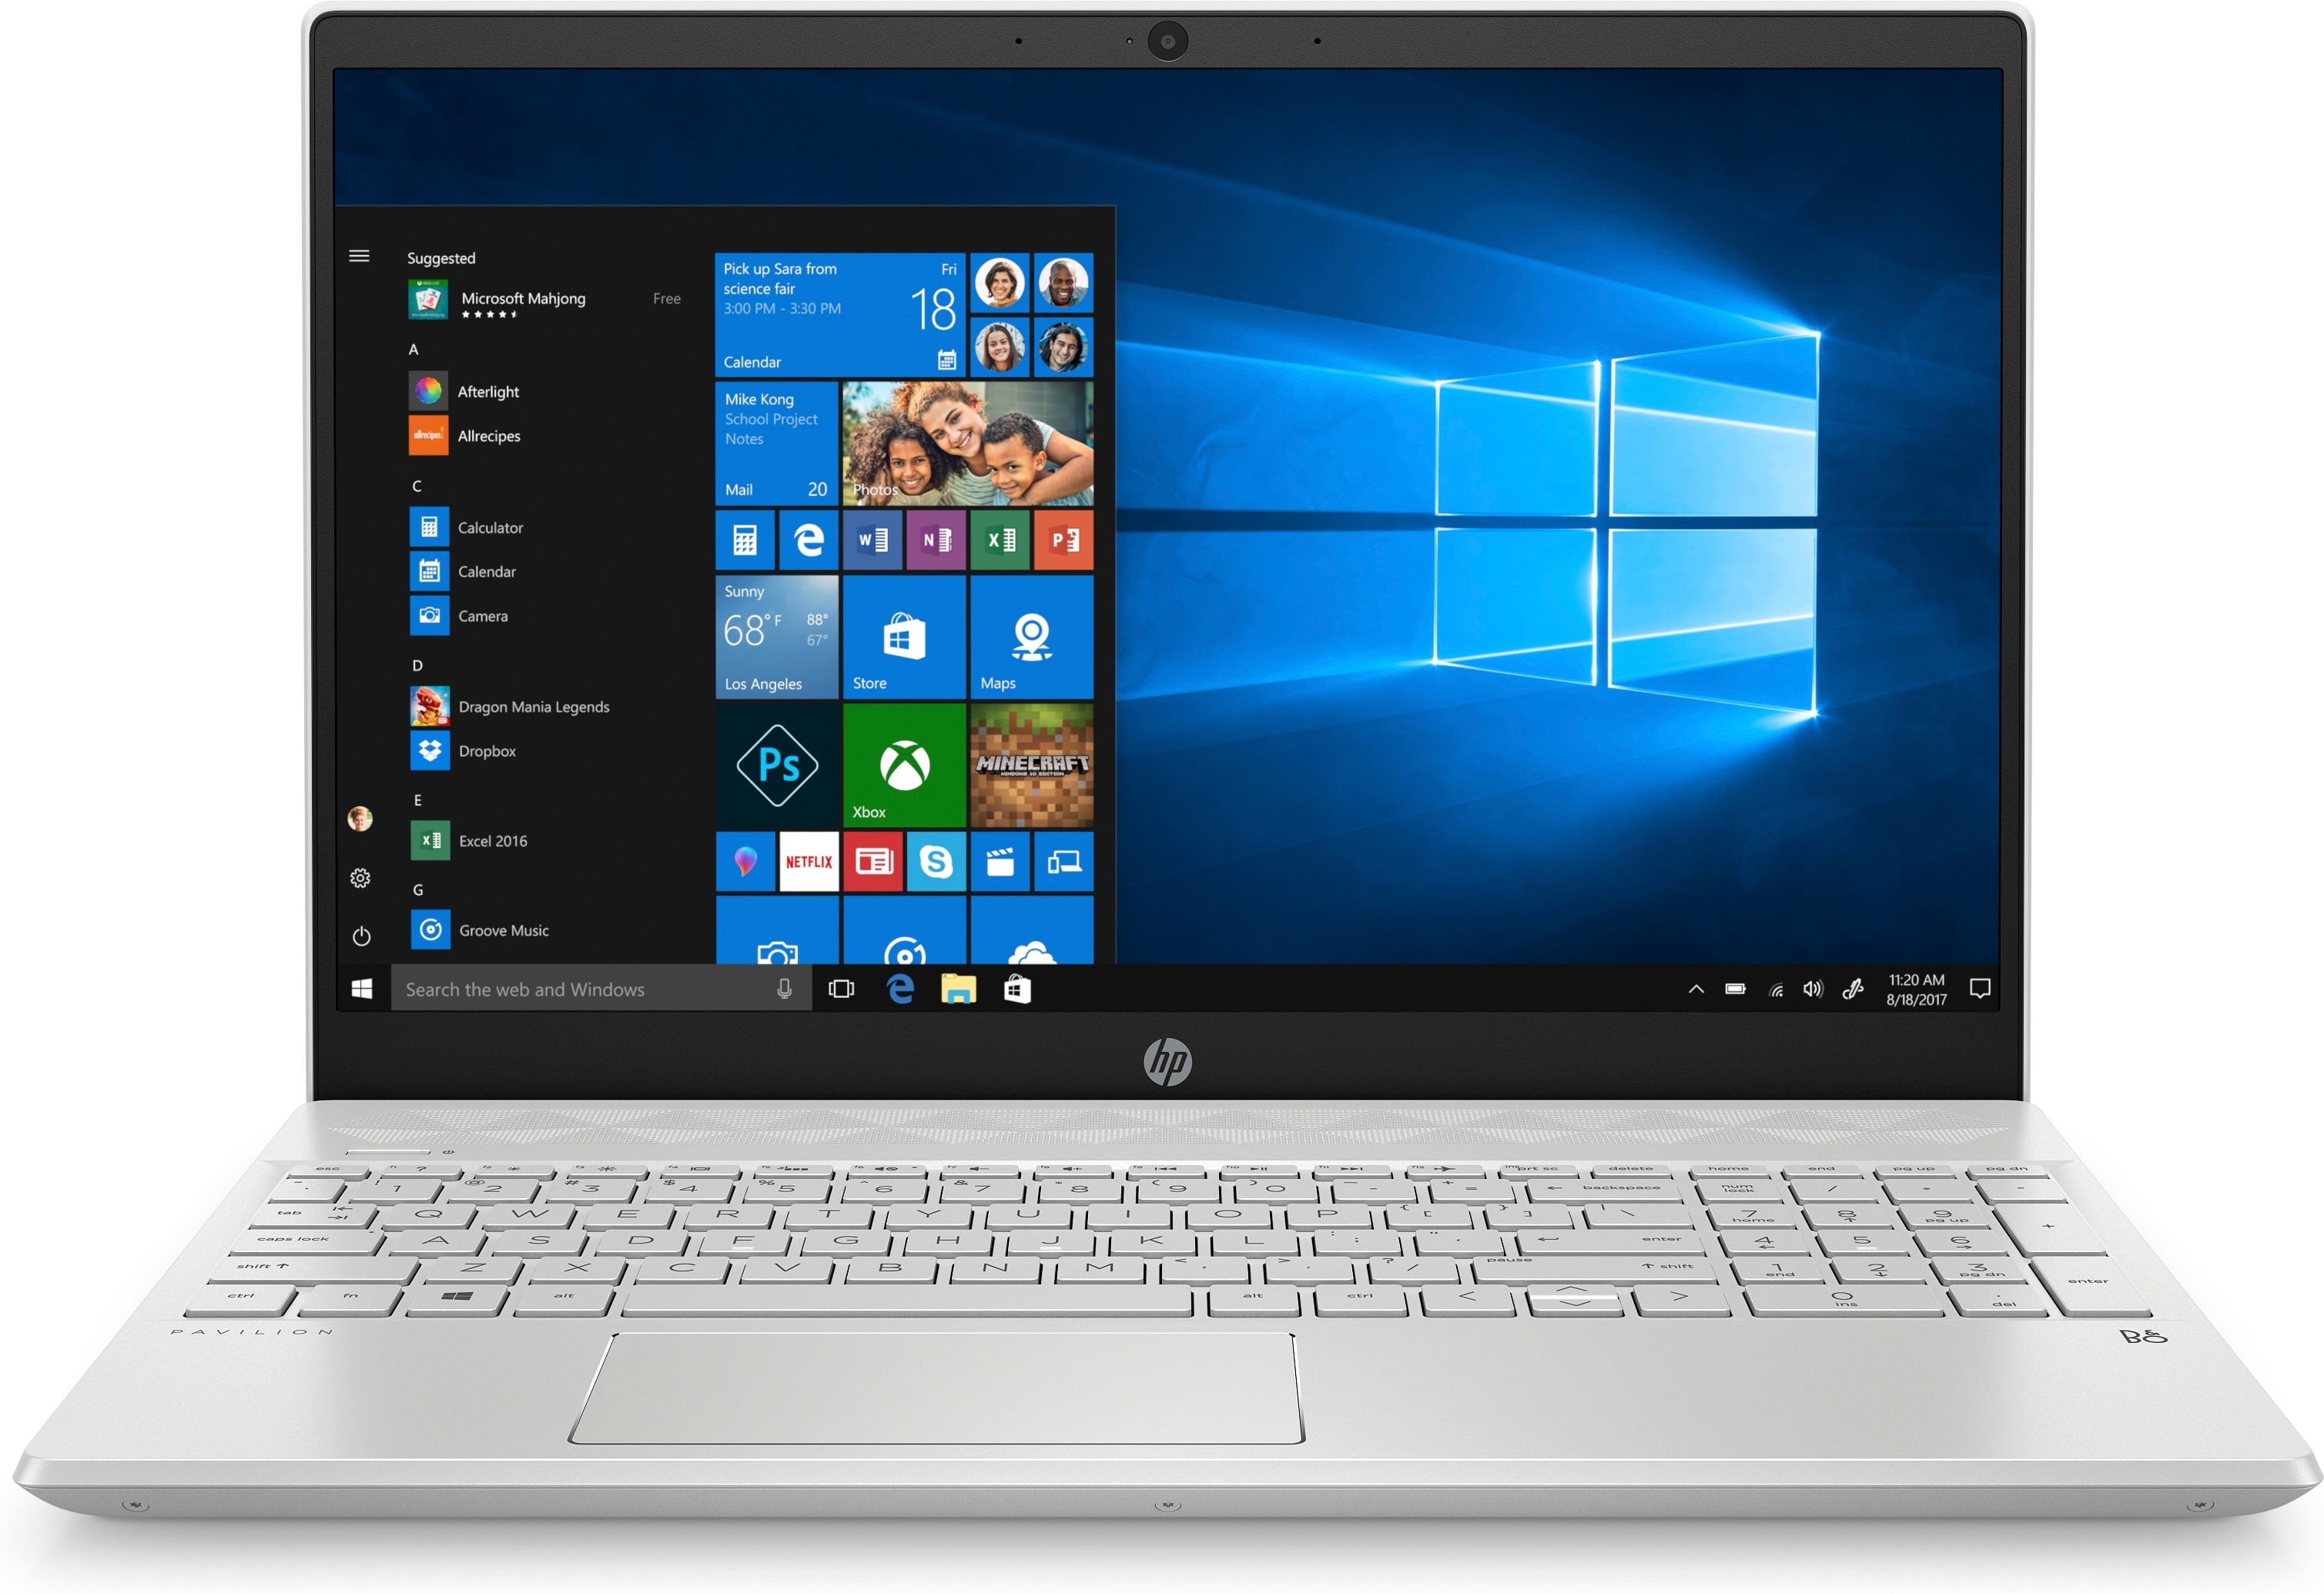 HP laptop Pavilion 15-cs2595nd - GeForce GTX 1050, 16 GB RAM, 512 GB SSD, 15.6 inch